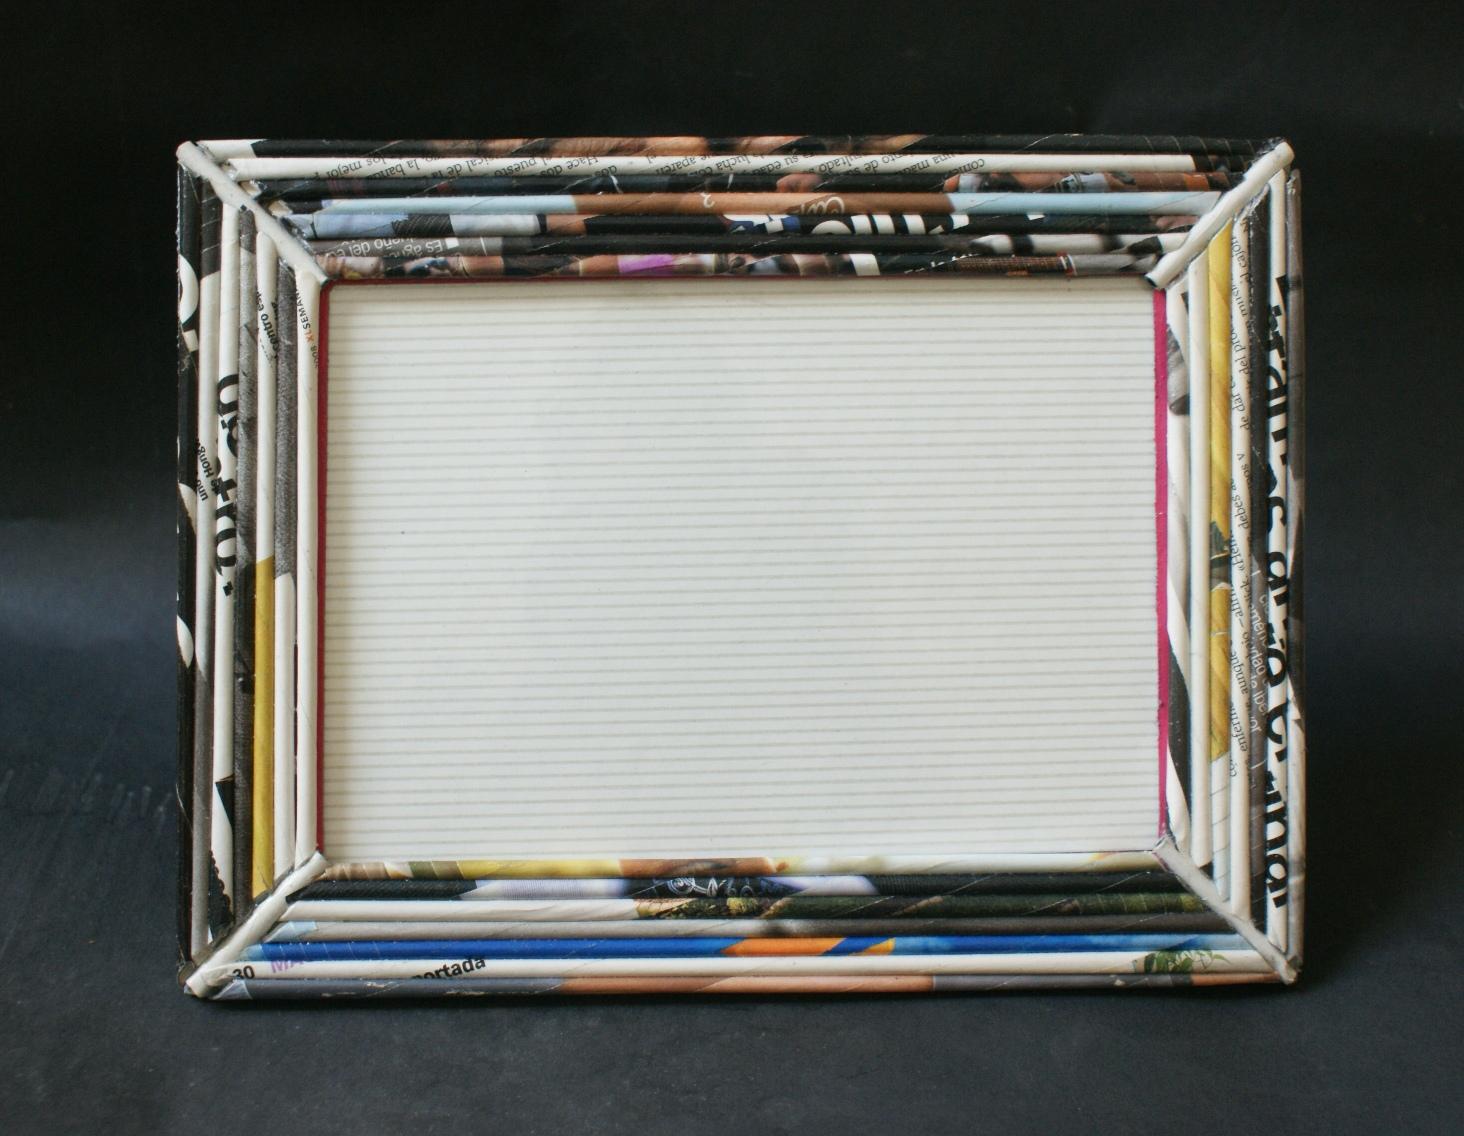 Portaretratos de papel de periódico - Imagui